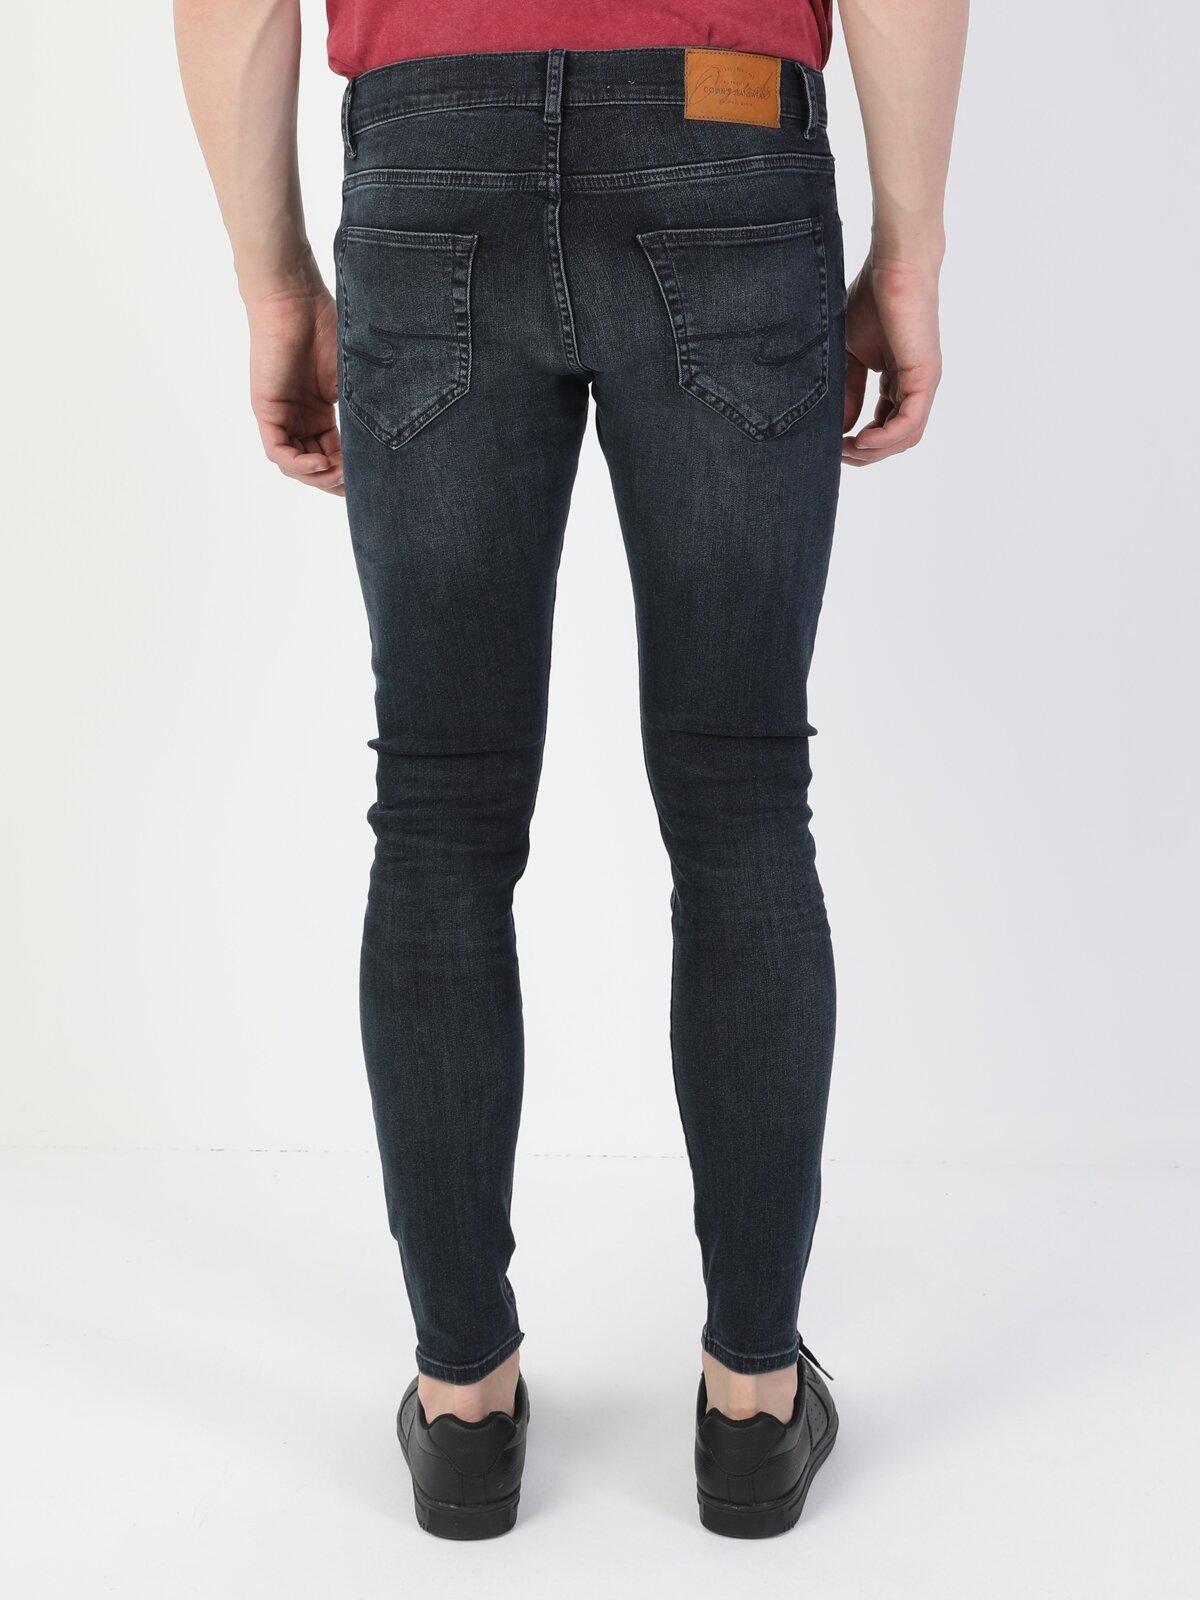 040 Alex Süper Dar Kesim Düşük Bel Süper Dar Paça Mavi Erkek Pantolon